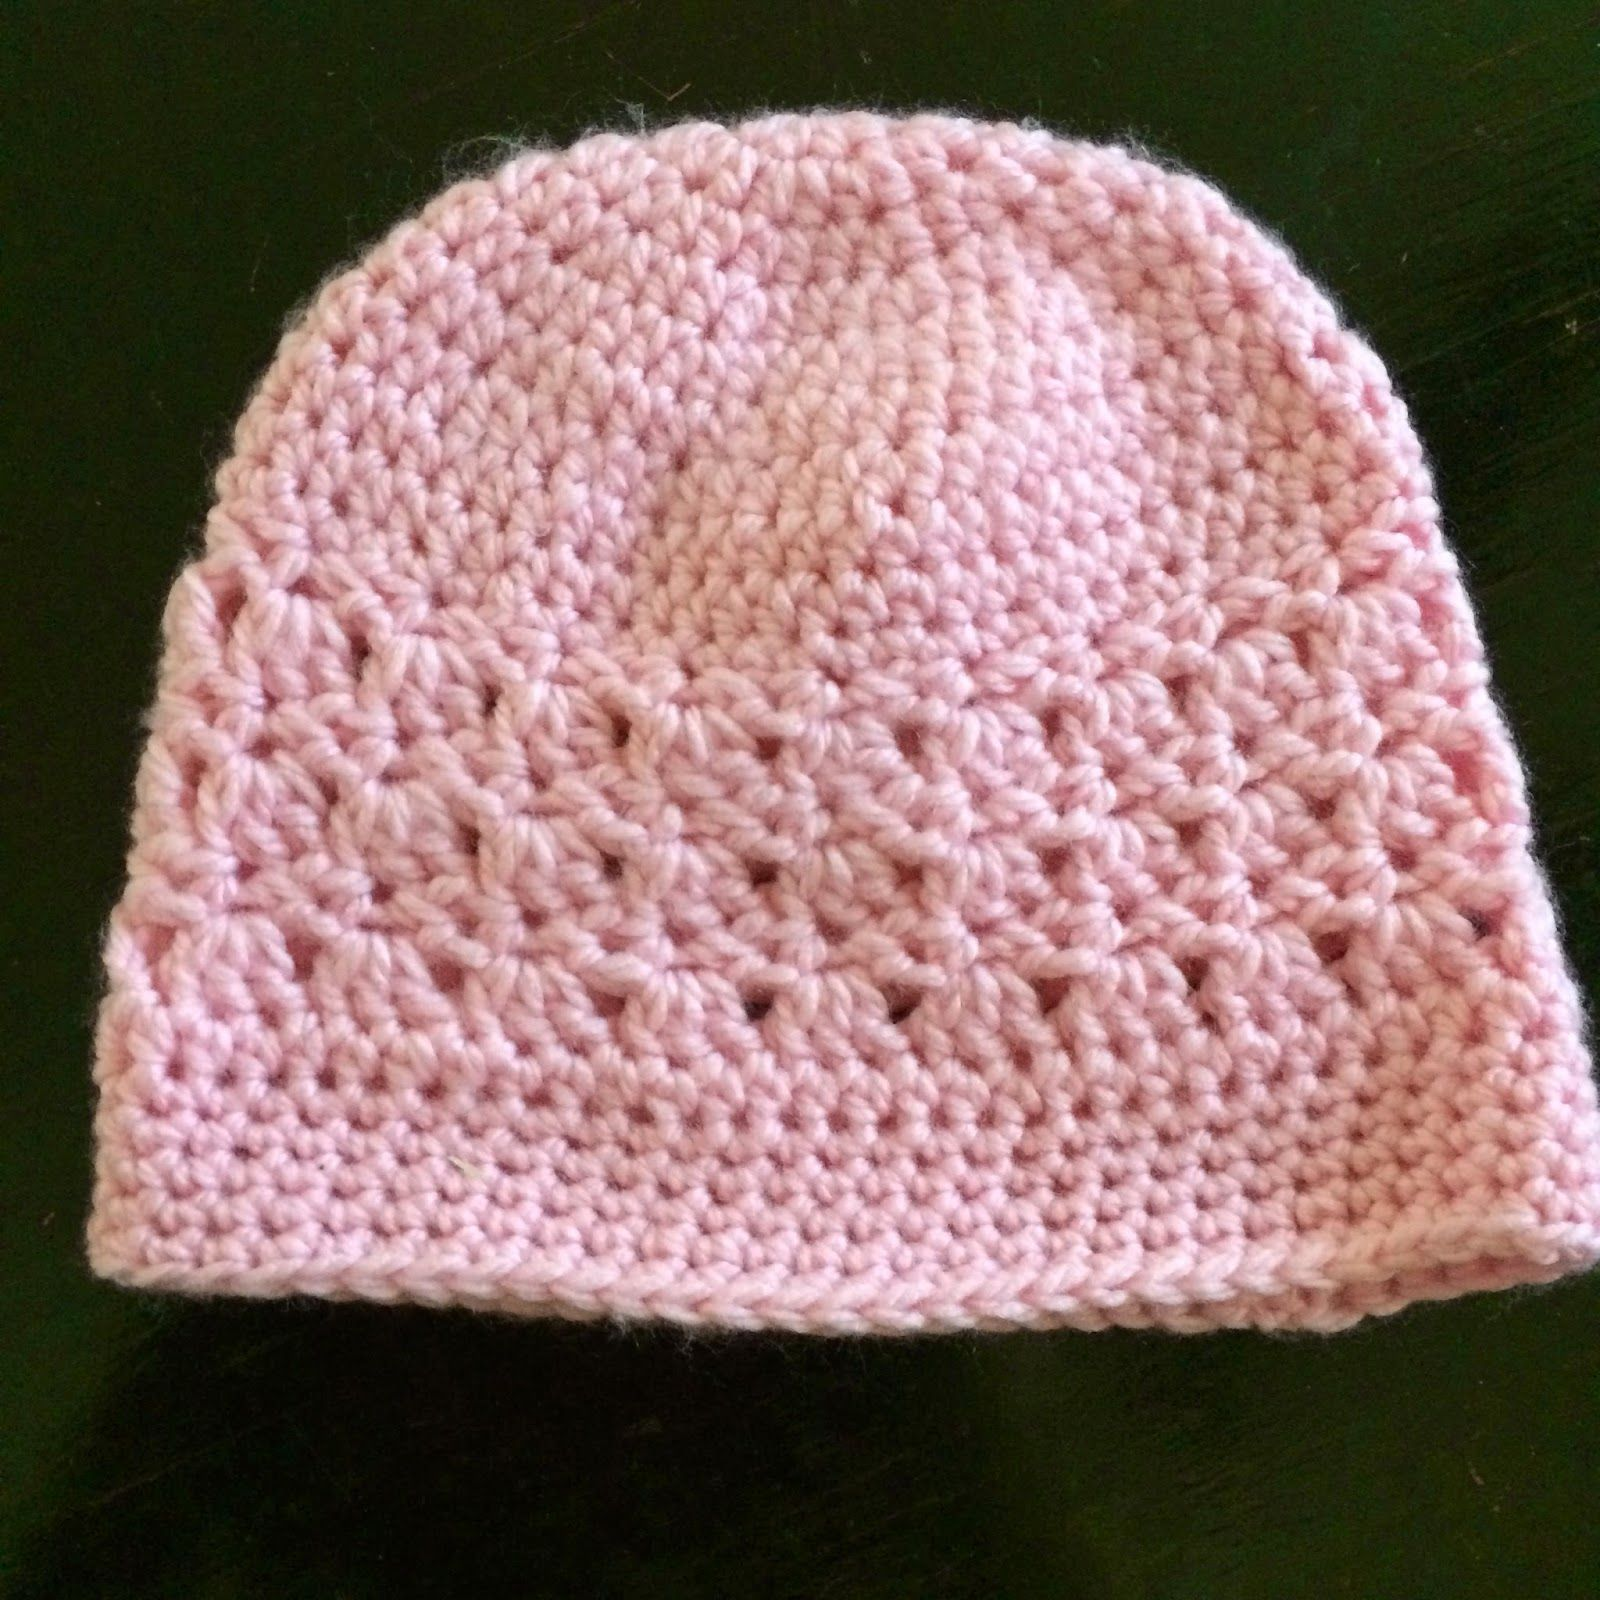 Not My Nana\'s Crochet!: Crochet Chemo Cap - Free Pattern | crochet ...